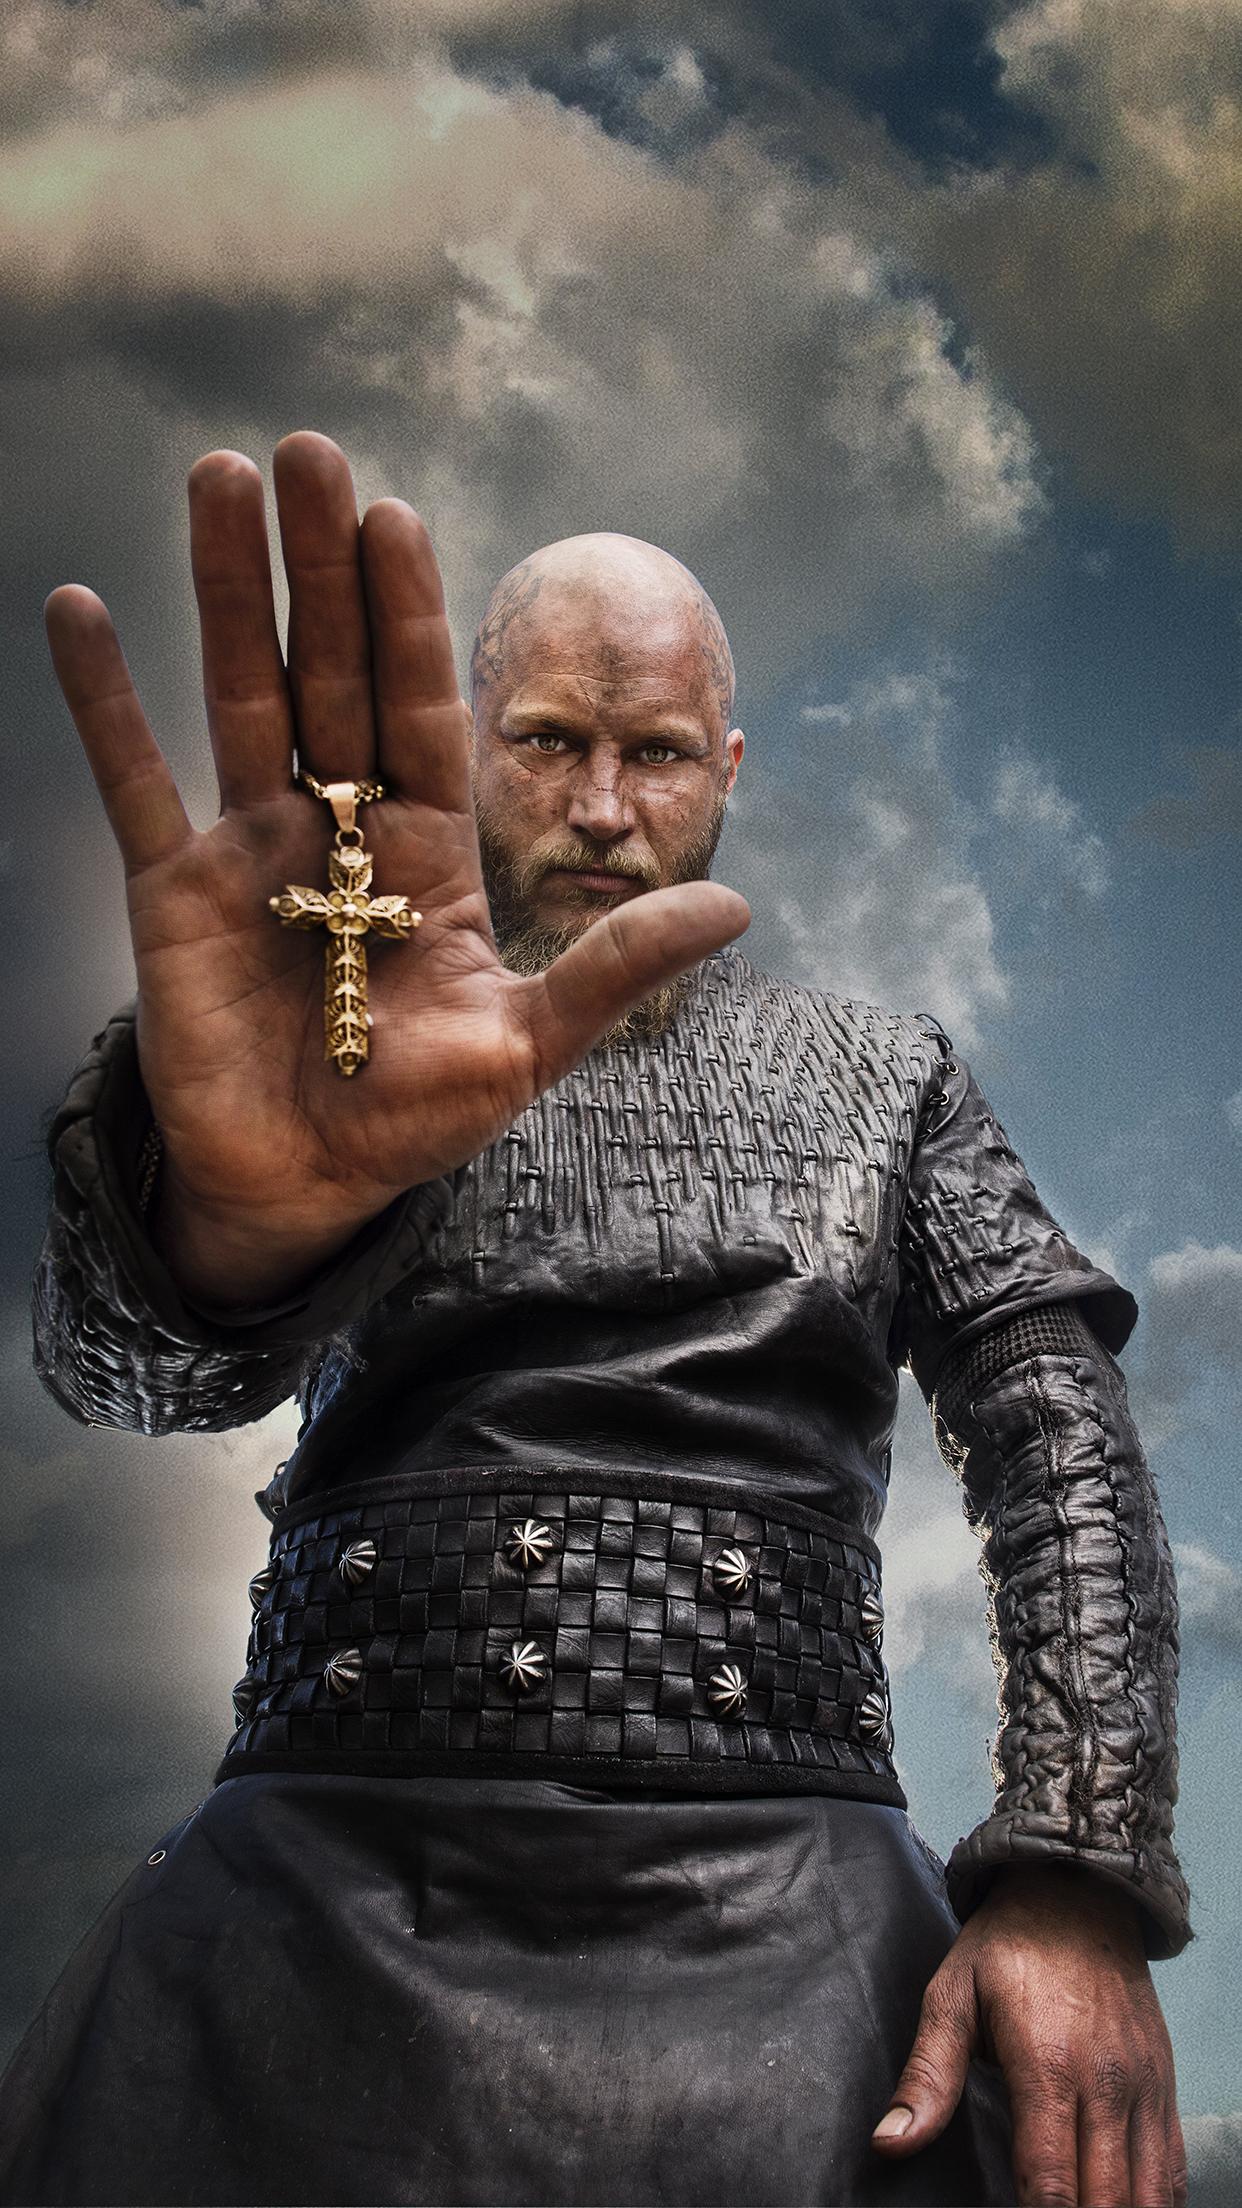 Vikings Ragnar Cross Wallpapers Iphone Parallax